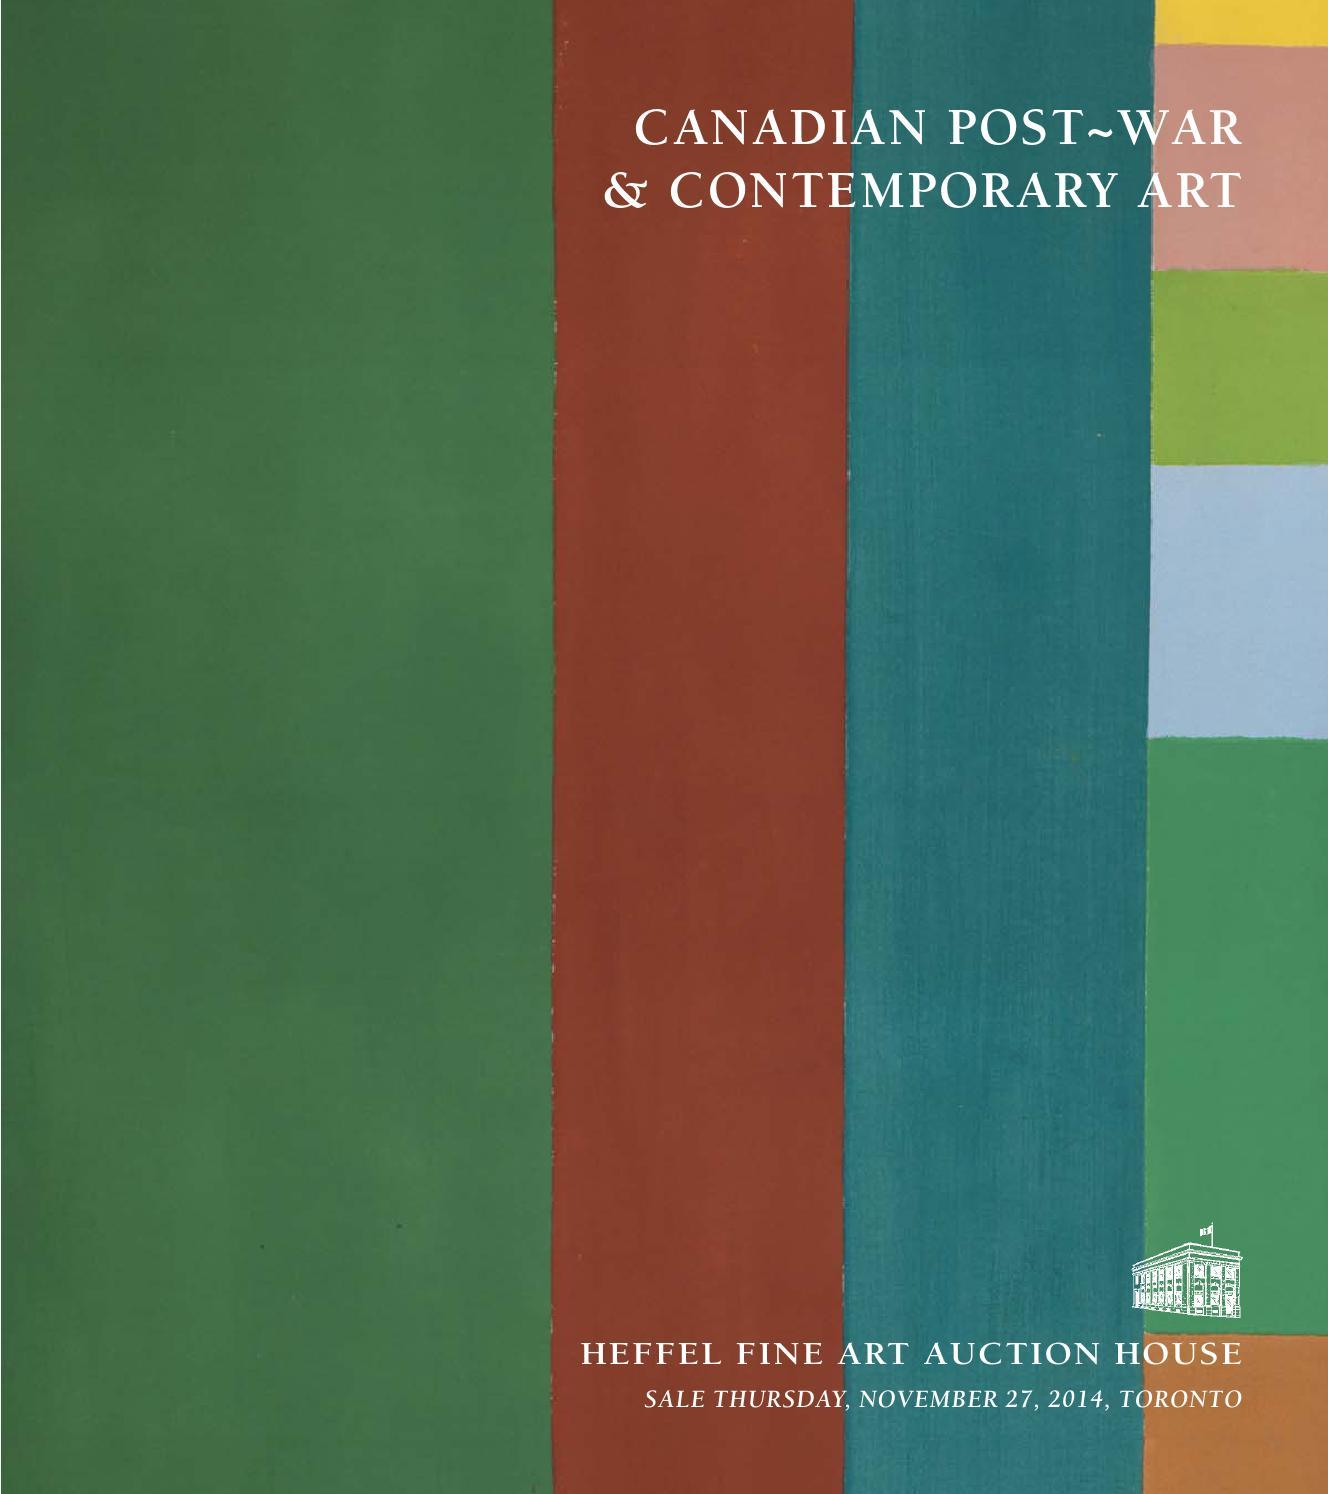 Canadian Post~War & Contemporary by Heffel Fine Art Auction